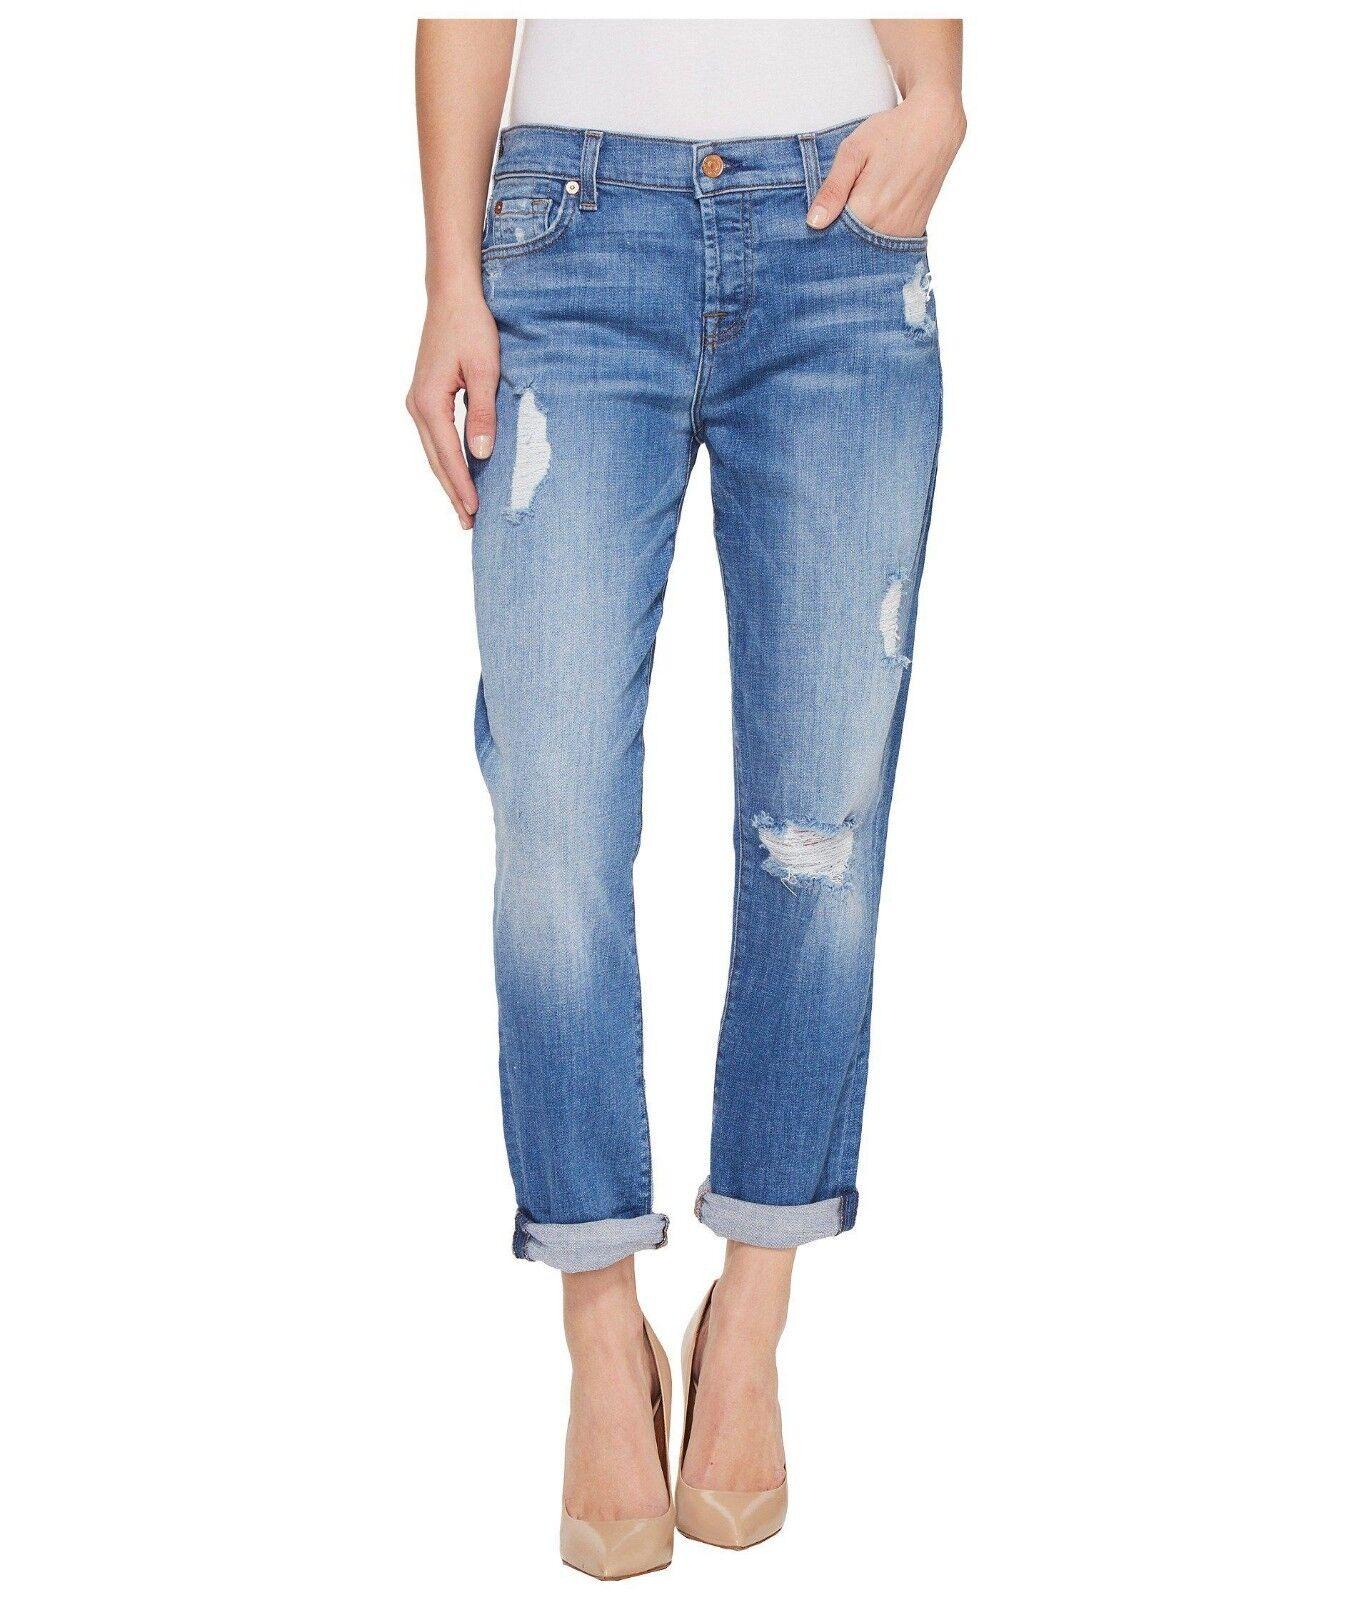 7 For All Mankind JOSEFINA Destroyed Boyfriend Jeans Adelaide Bright bluee 26 NWT